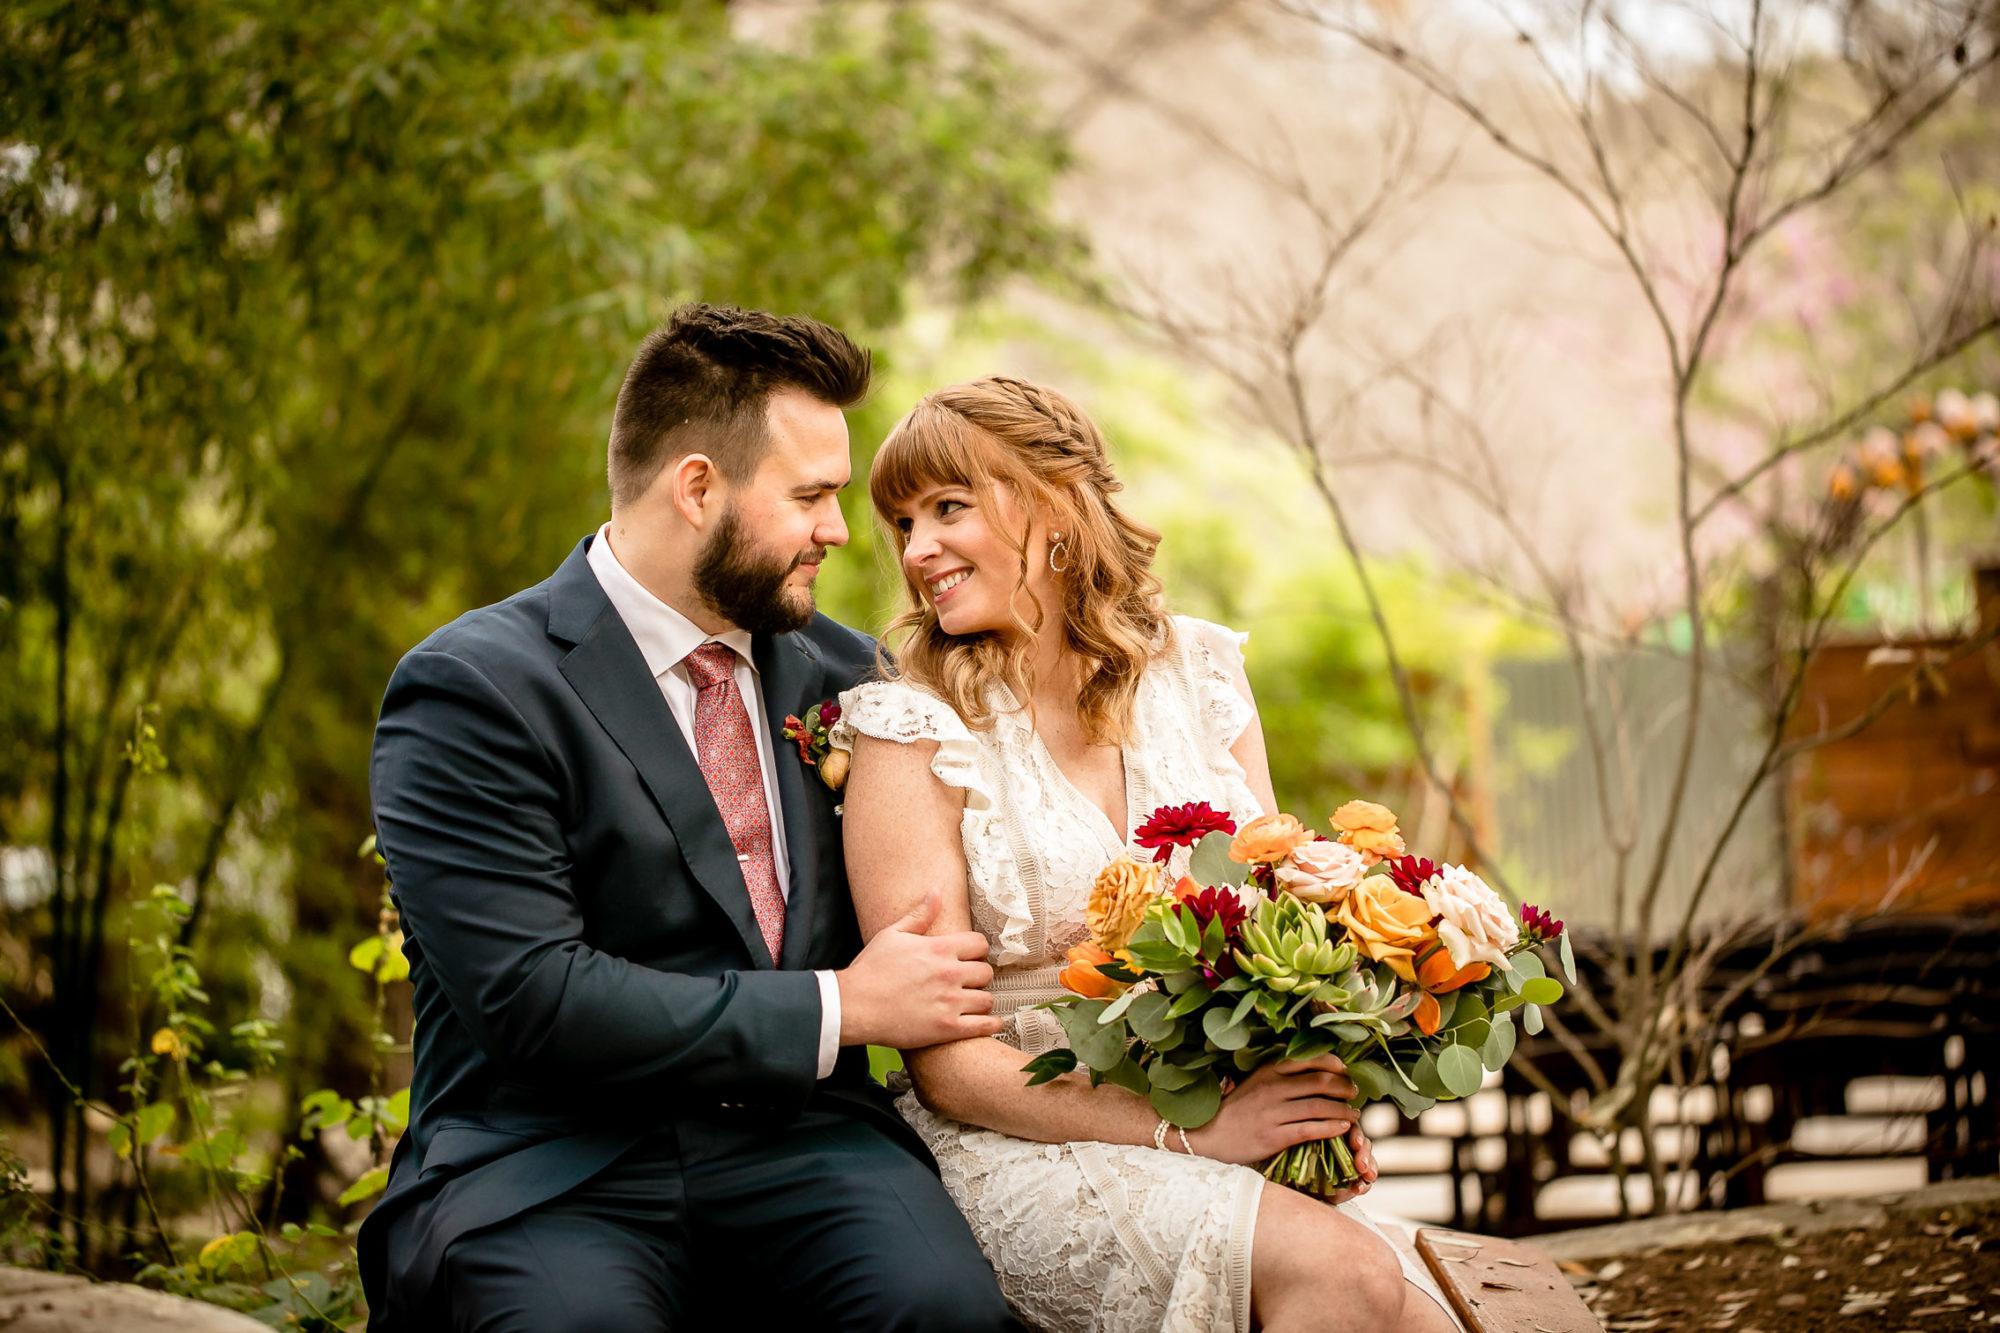 The Sanctuary Wedding Venue